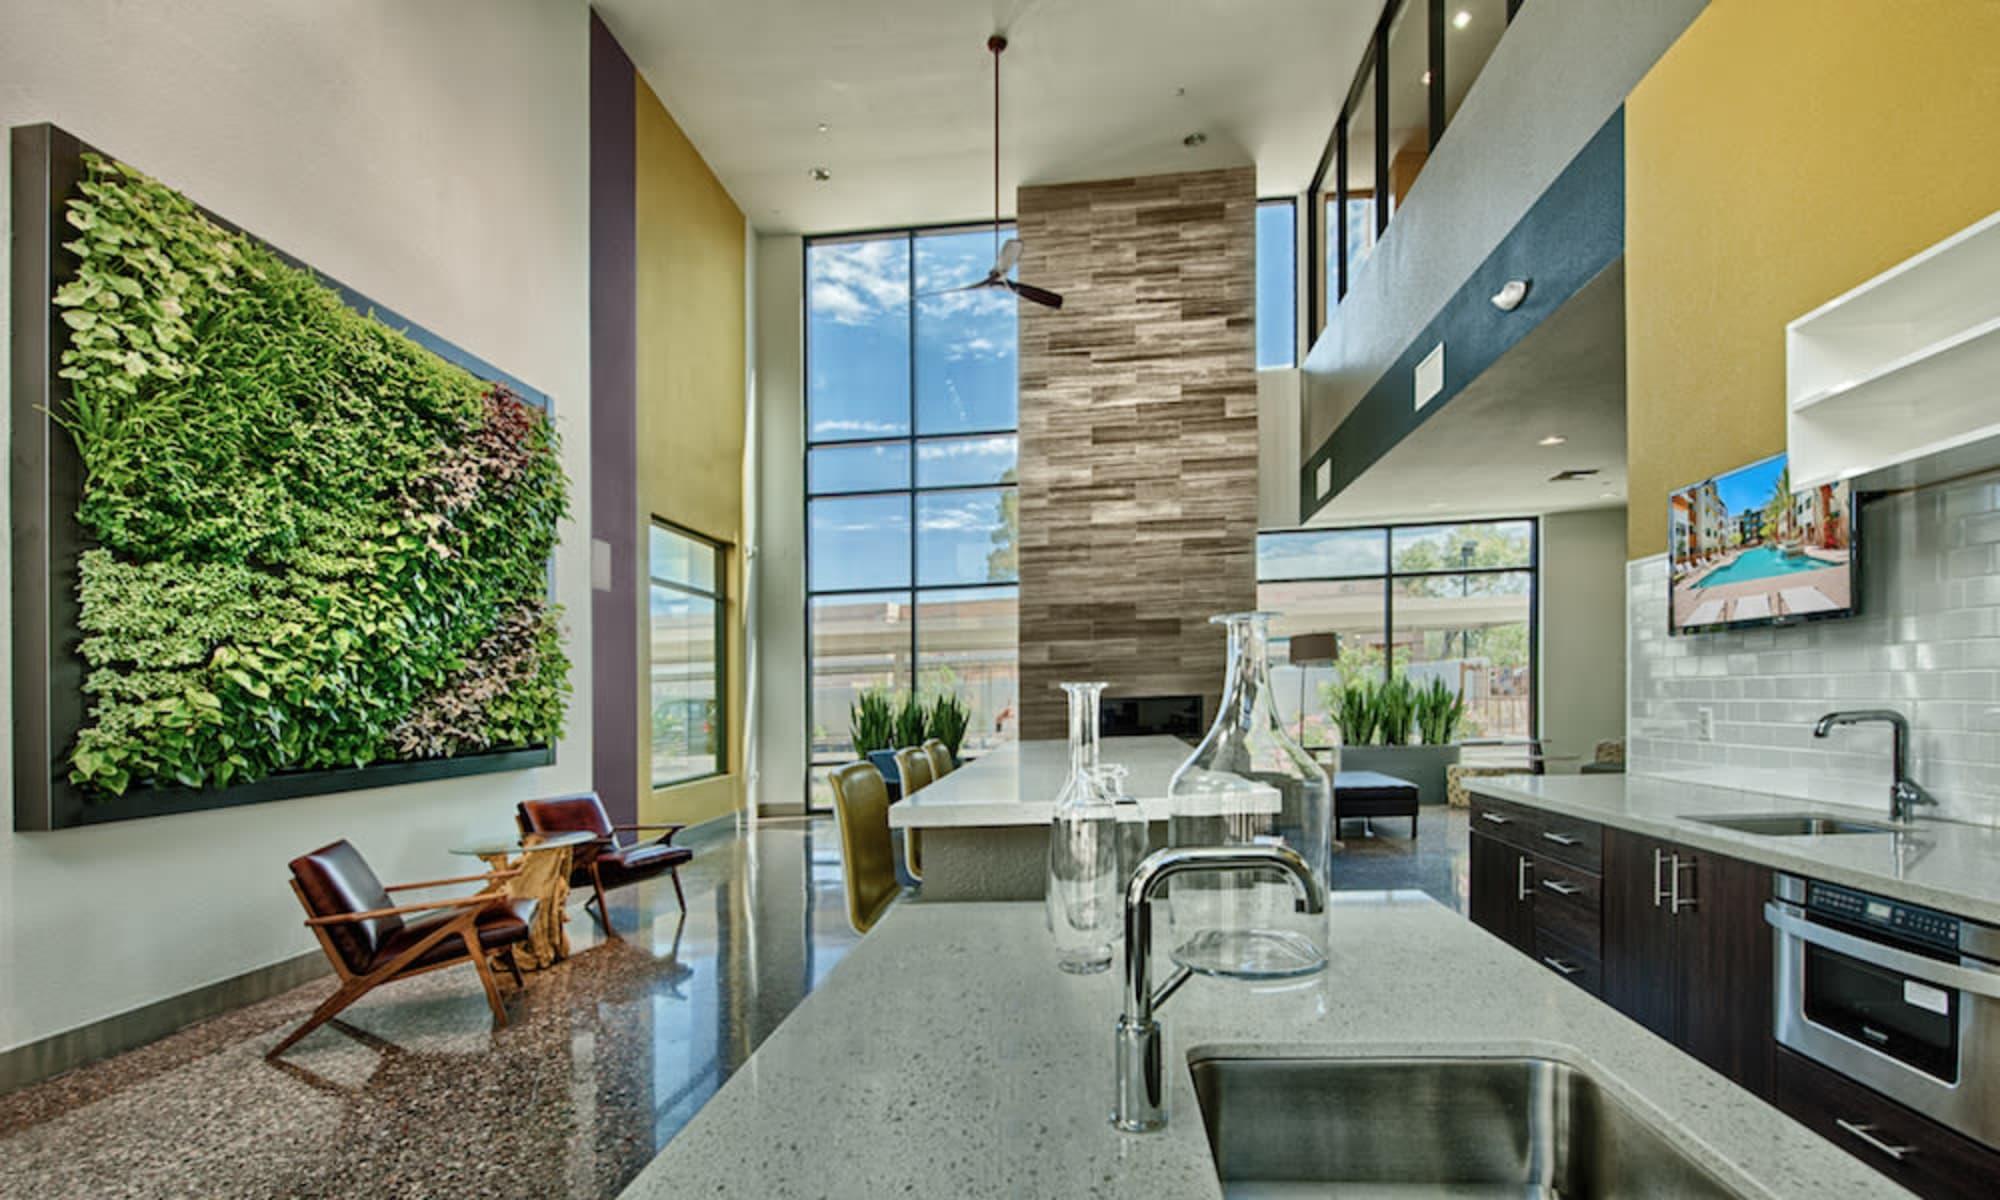 Apartments in Phoenix, Arizona at Cactus Forty-2